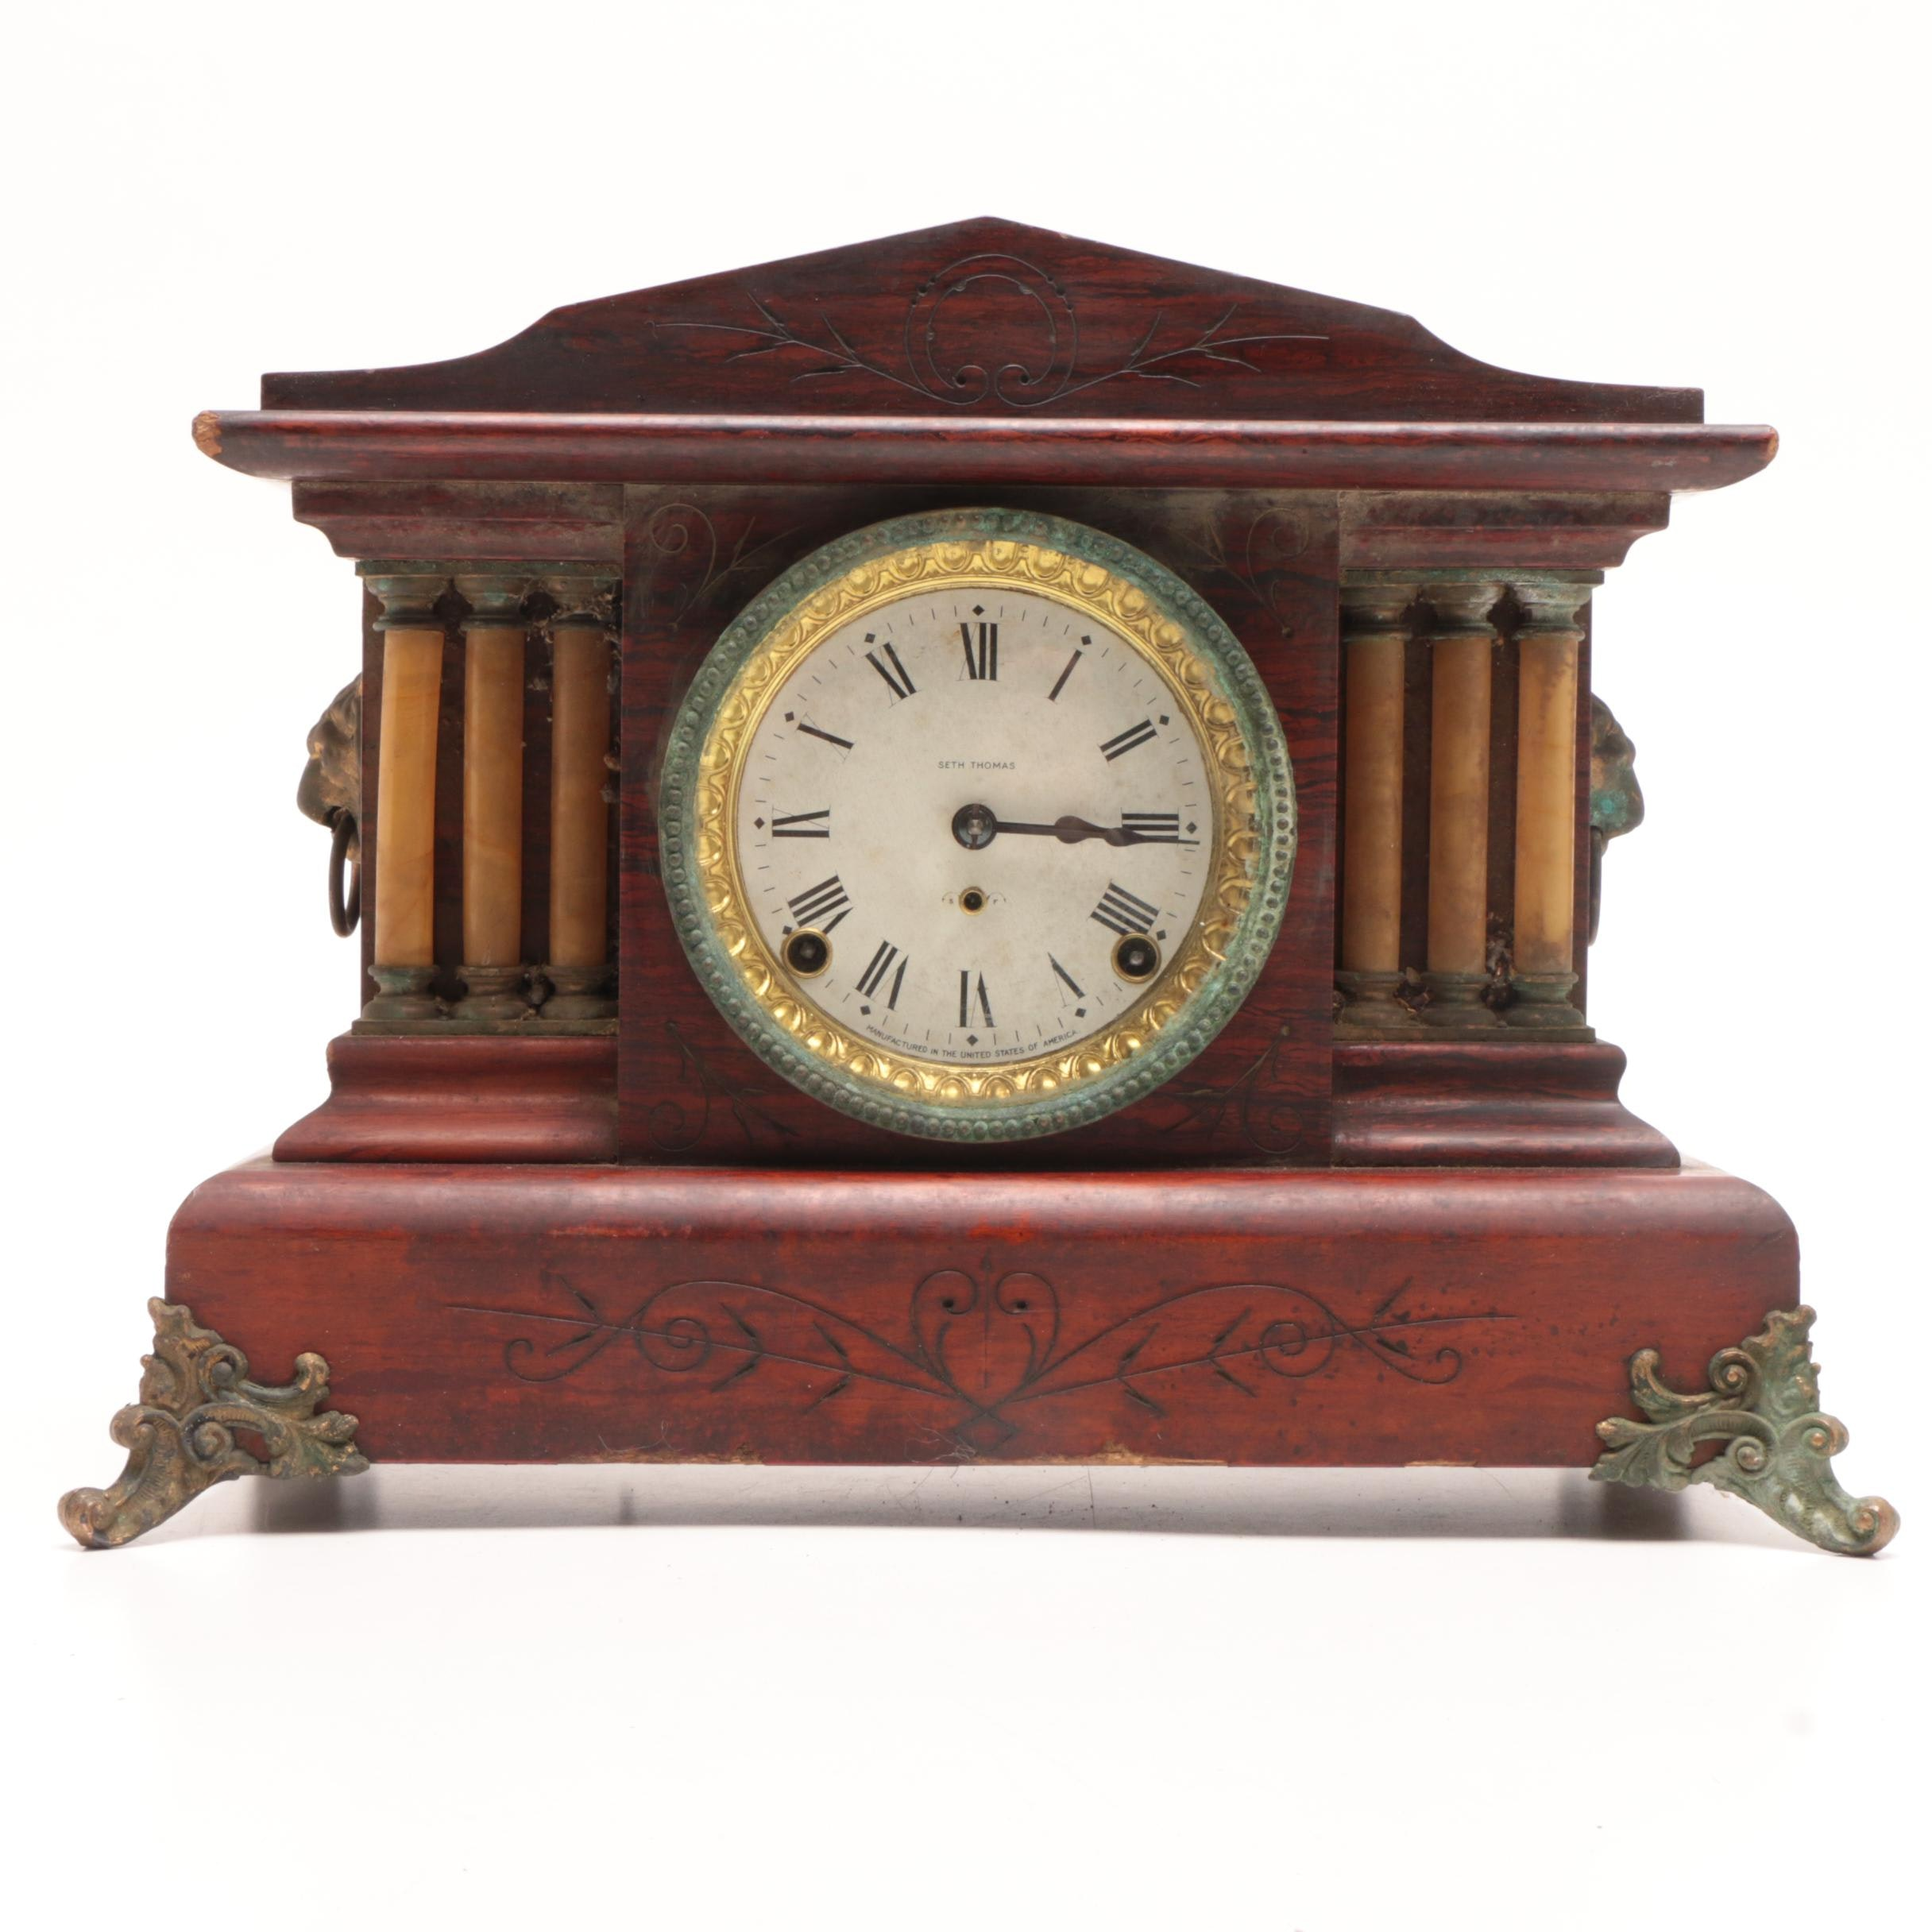 Seth Thomas Adamantine Mantel Clock with Rosewood Graining